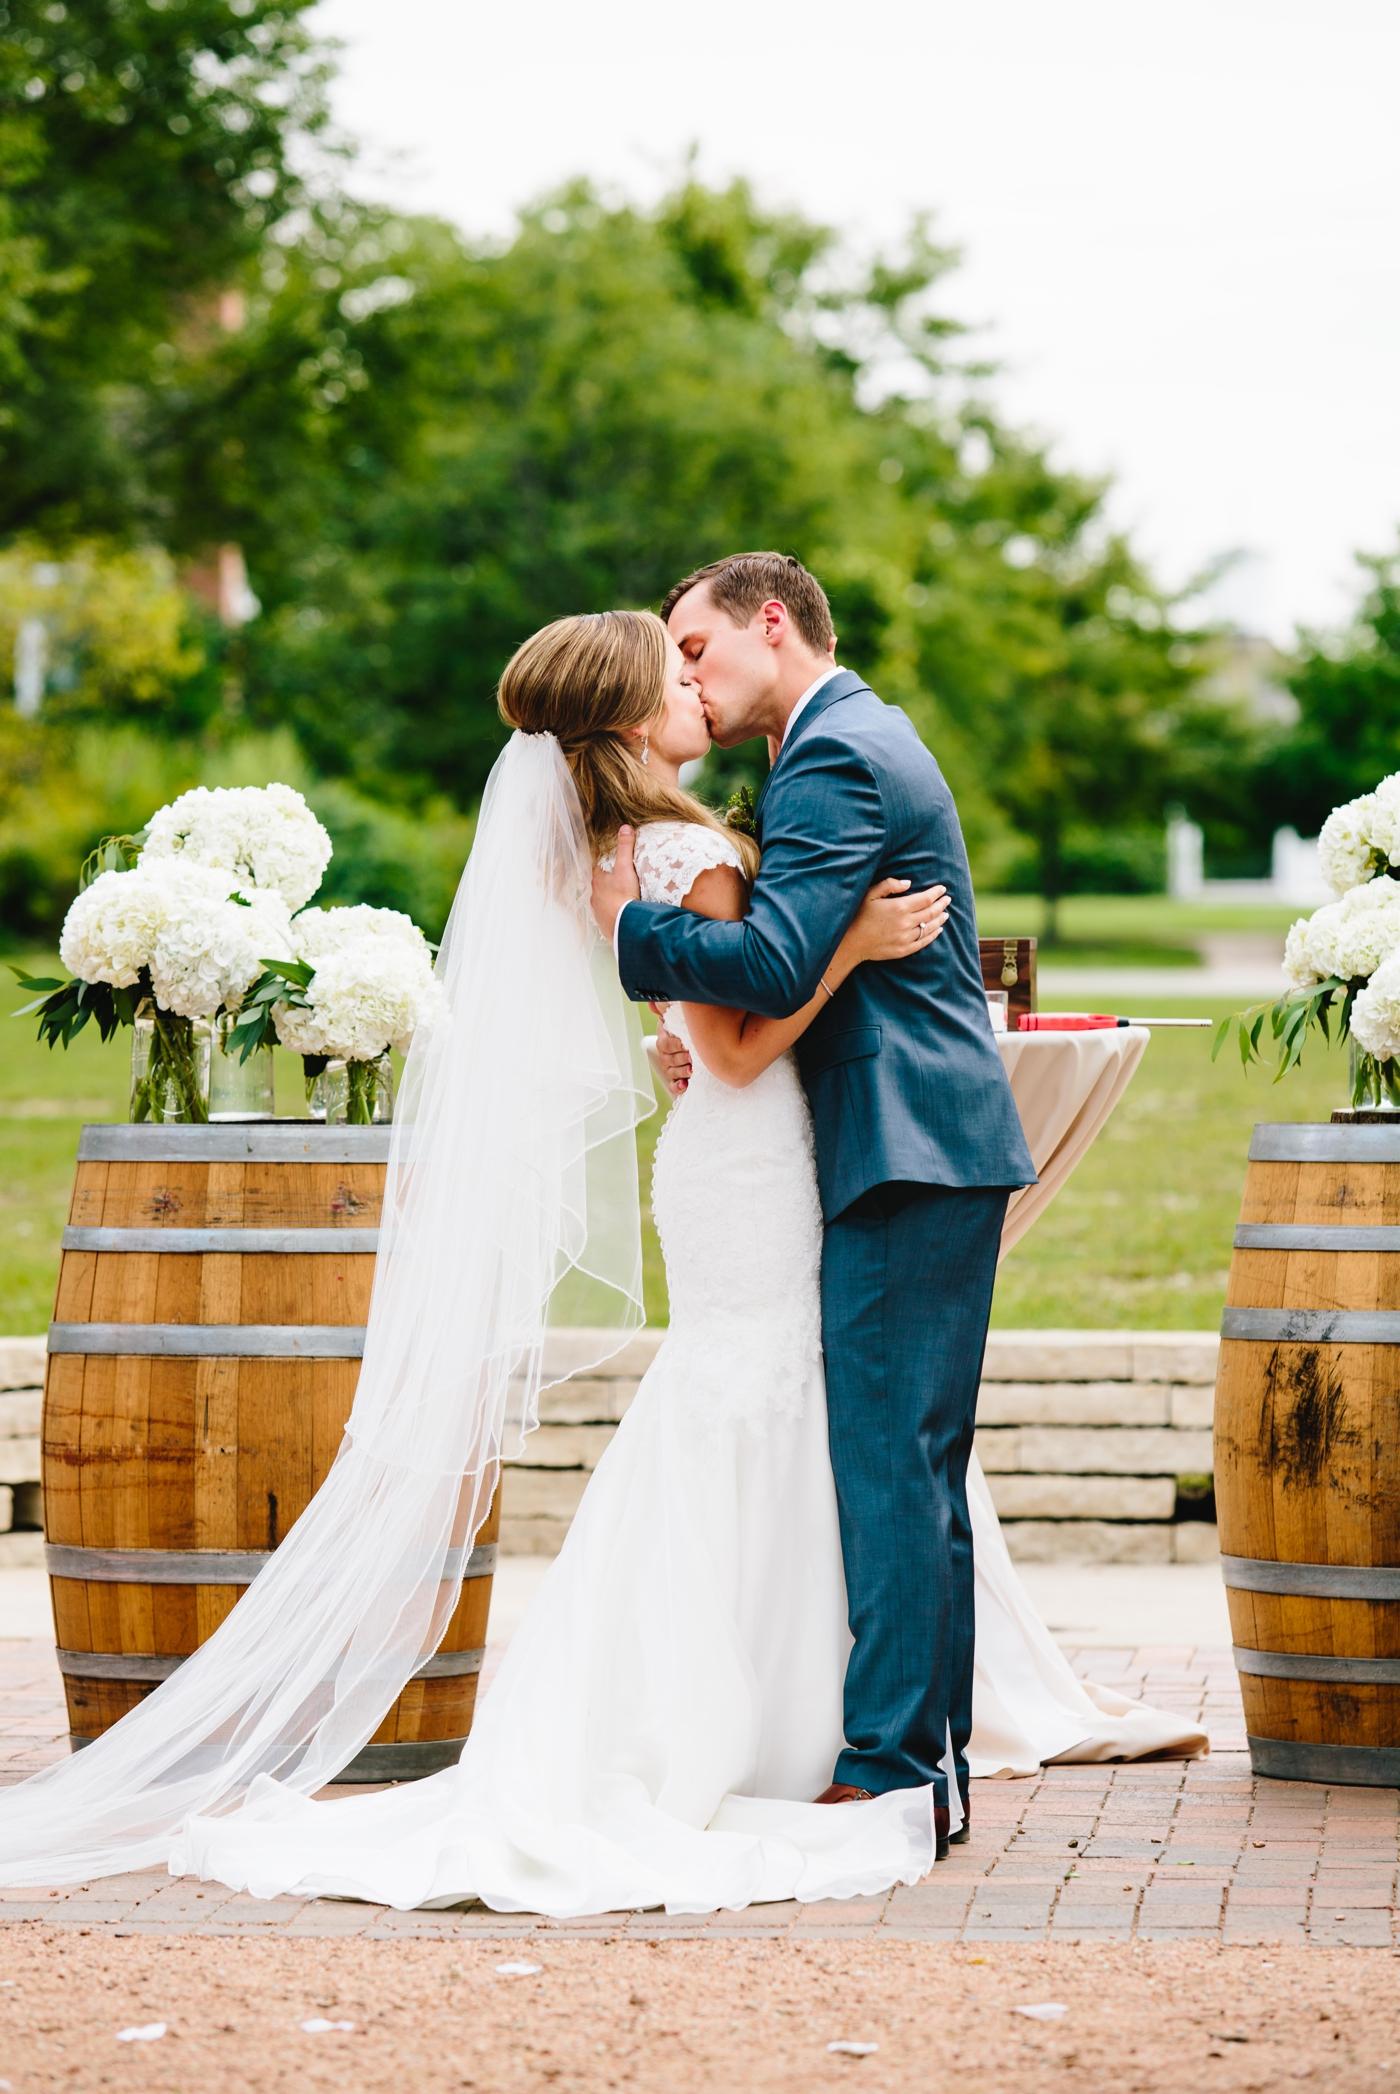 chicago-fine-art-wedding-photography-chiapetta30